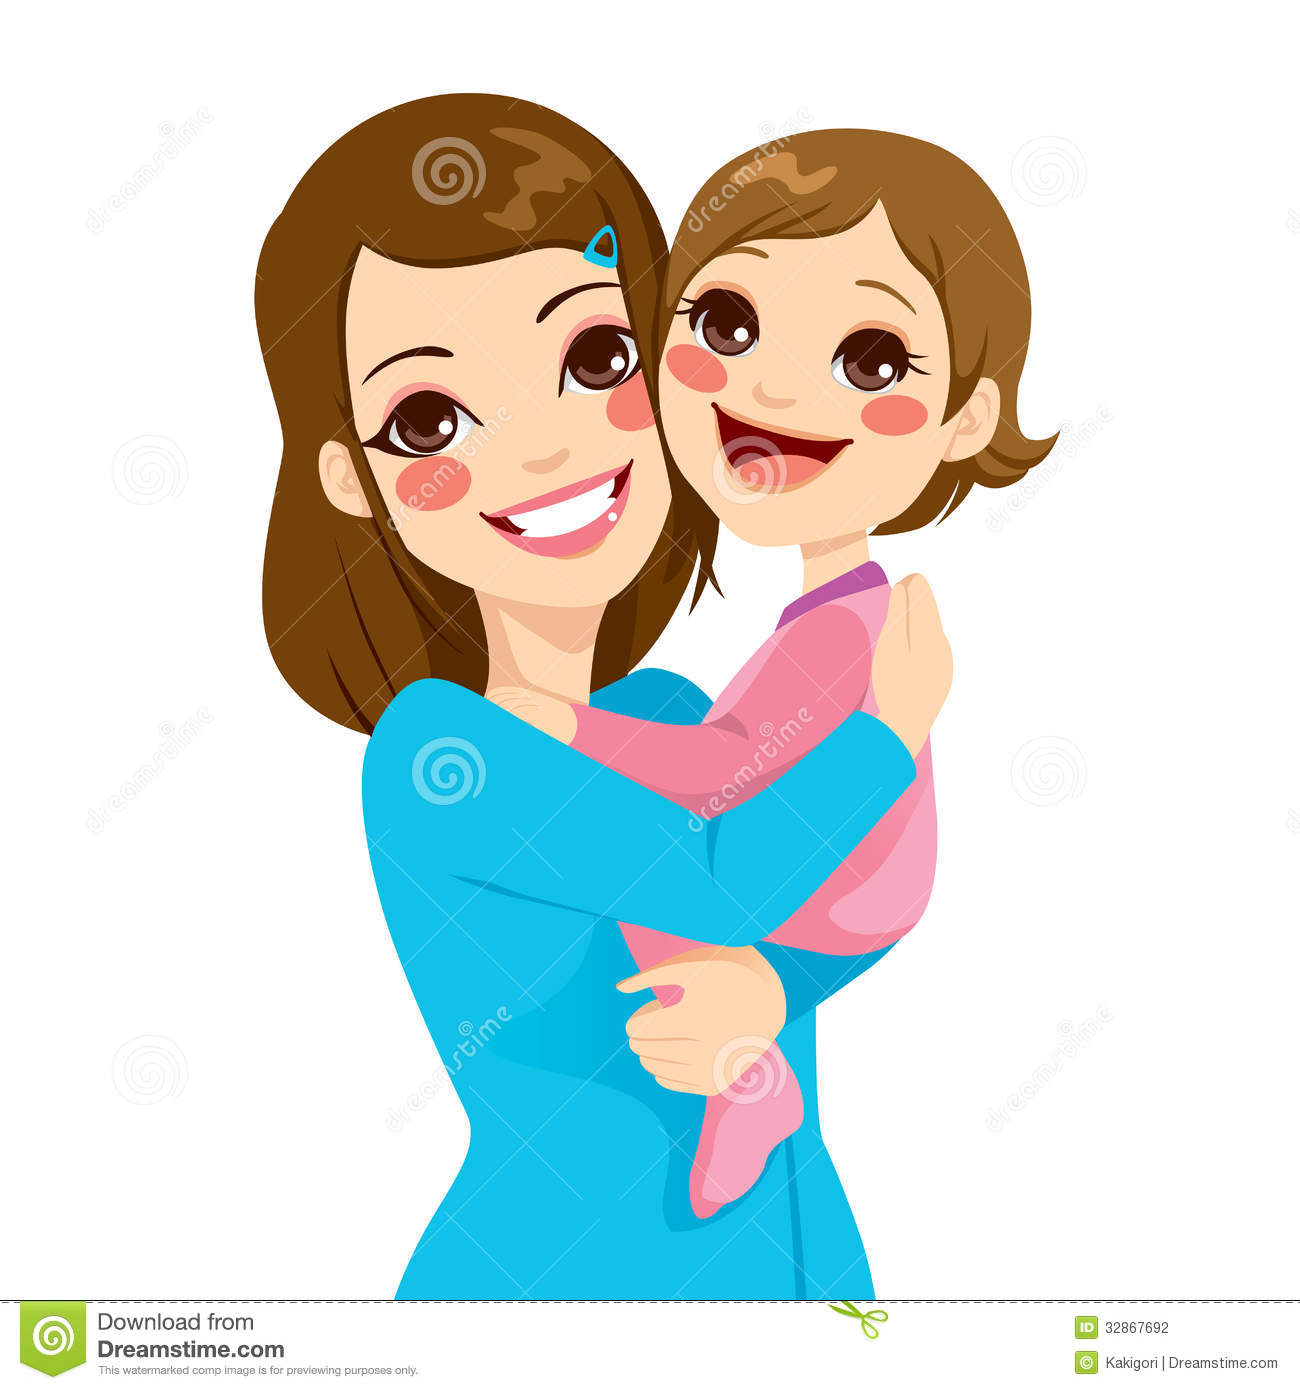 Cartoon Mother Clipart - Clipart Kid